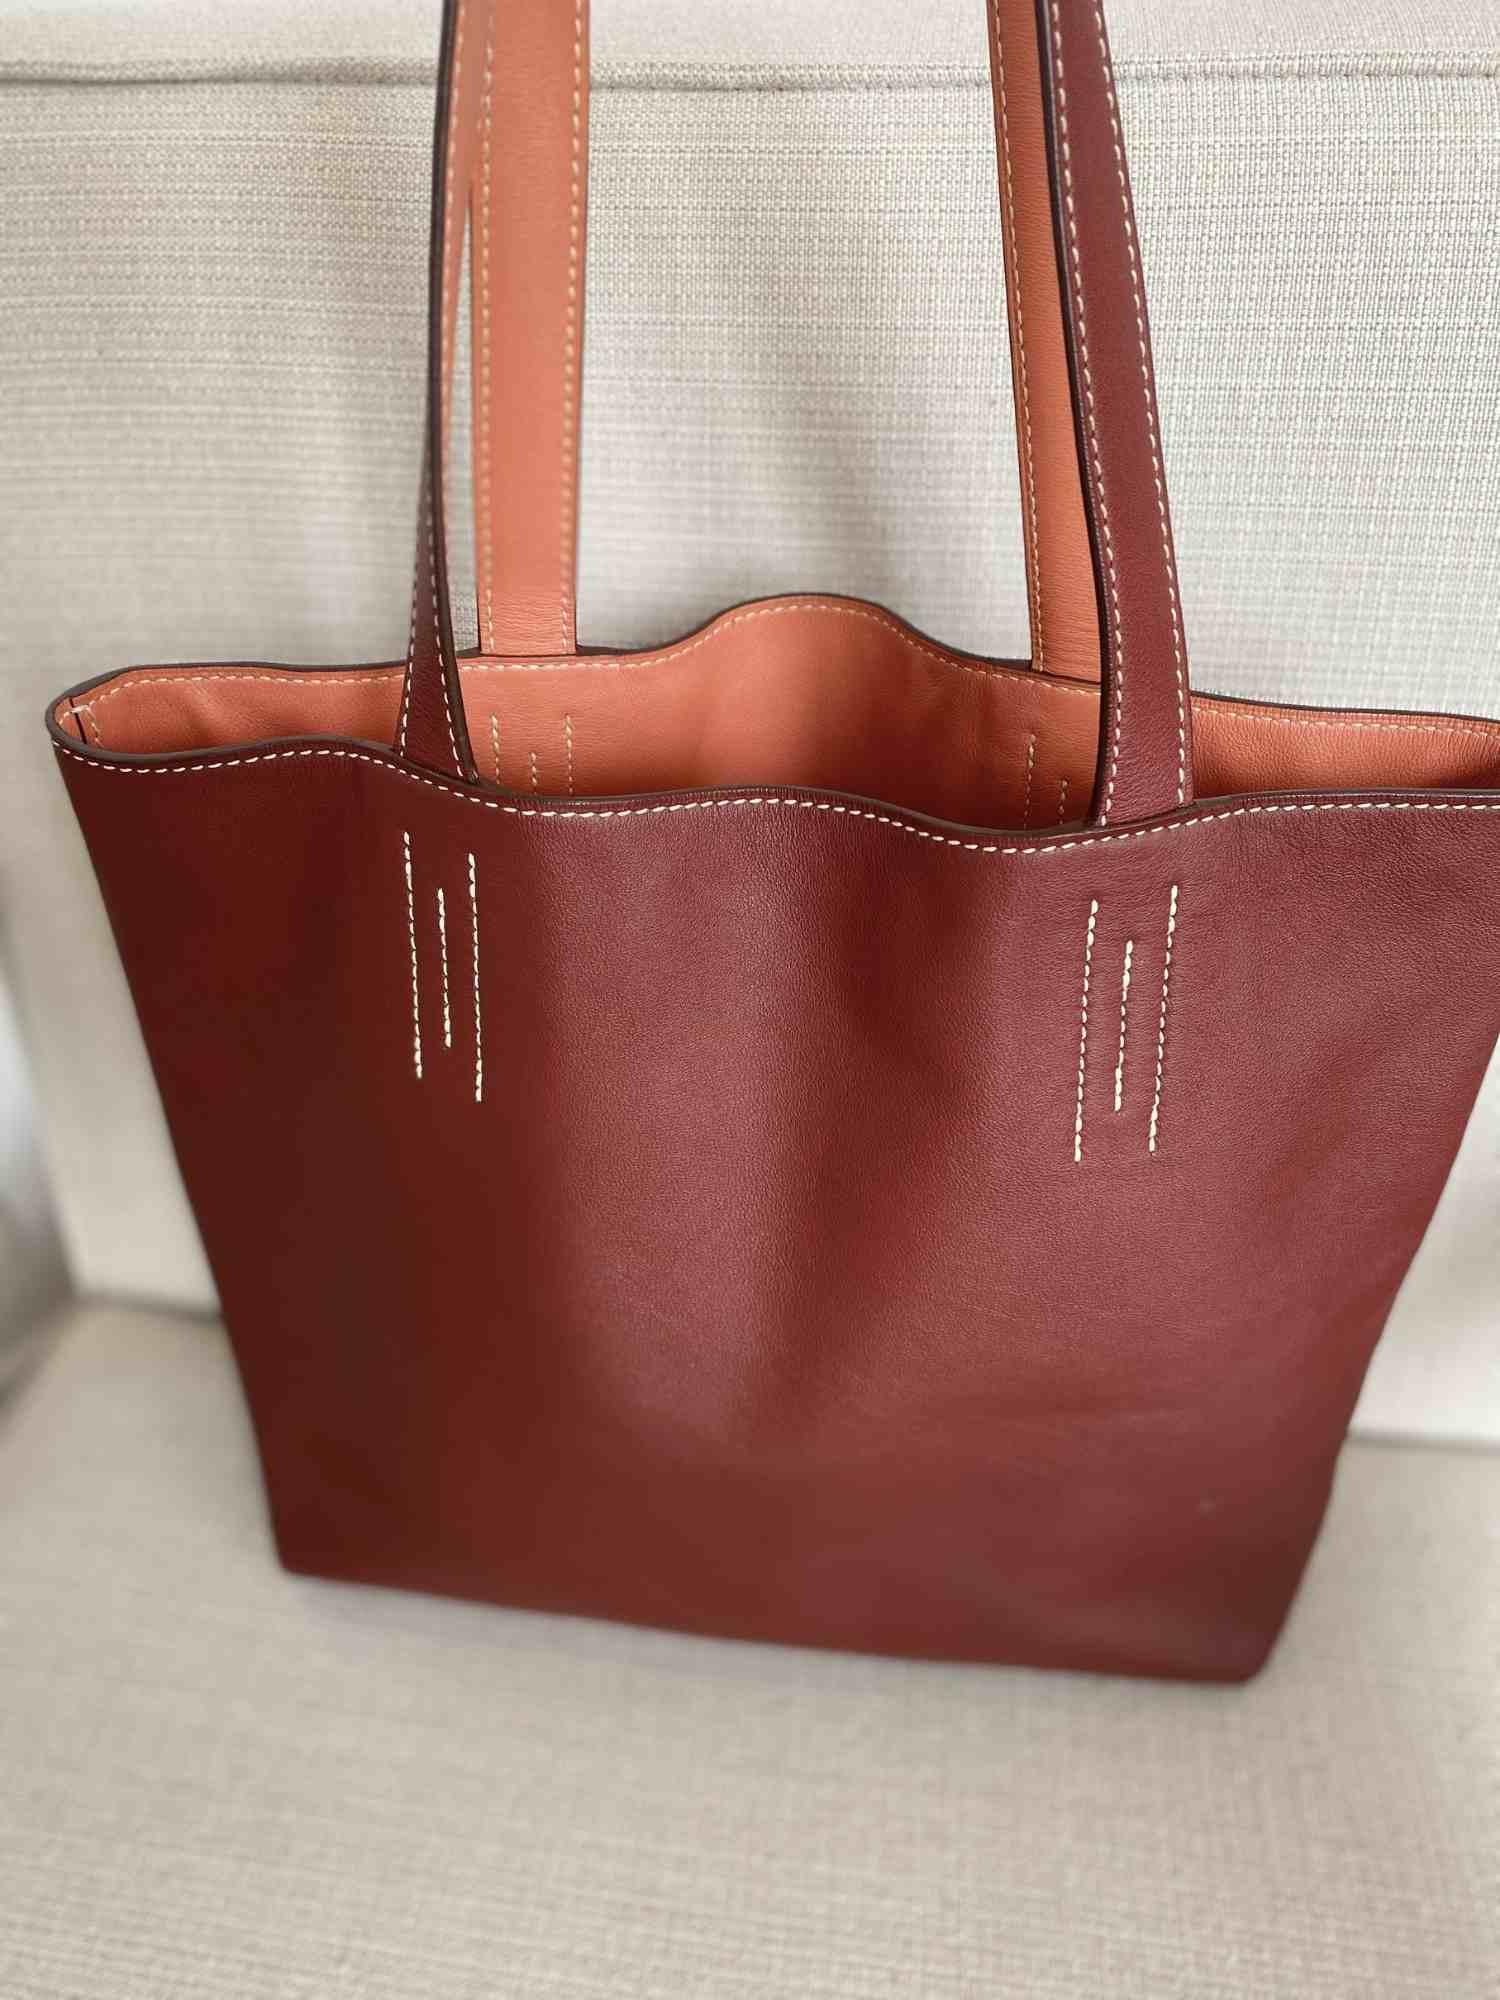 Bolsa Hermès Double Sens Bicolor